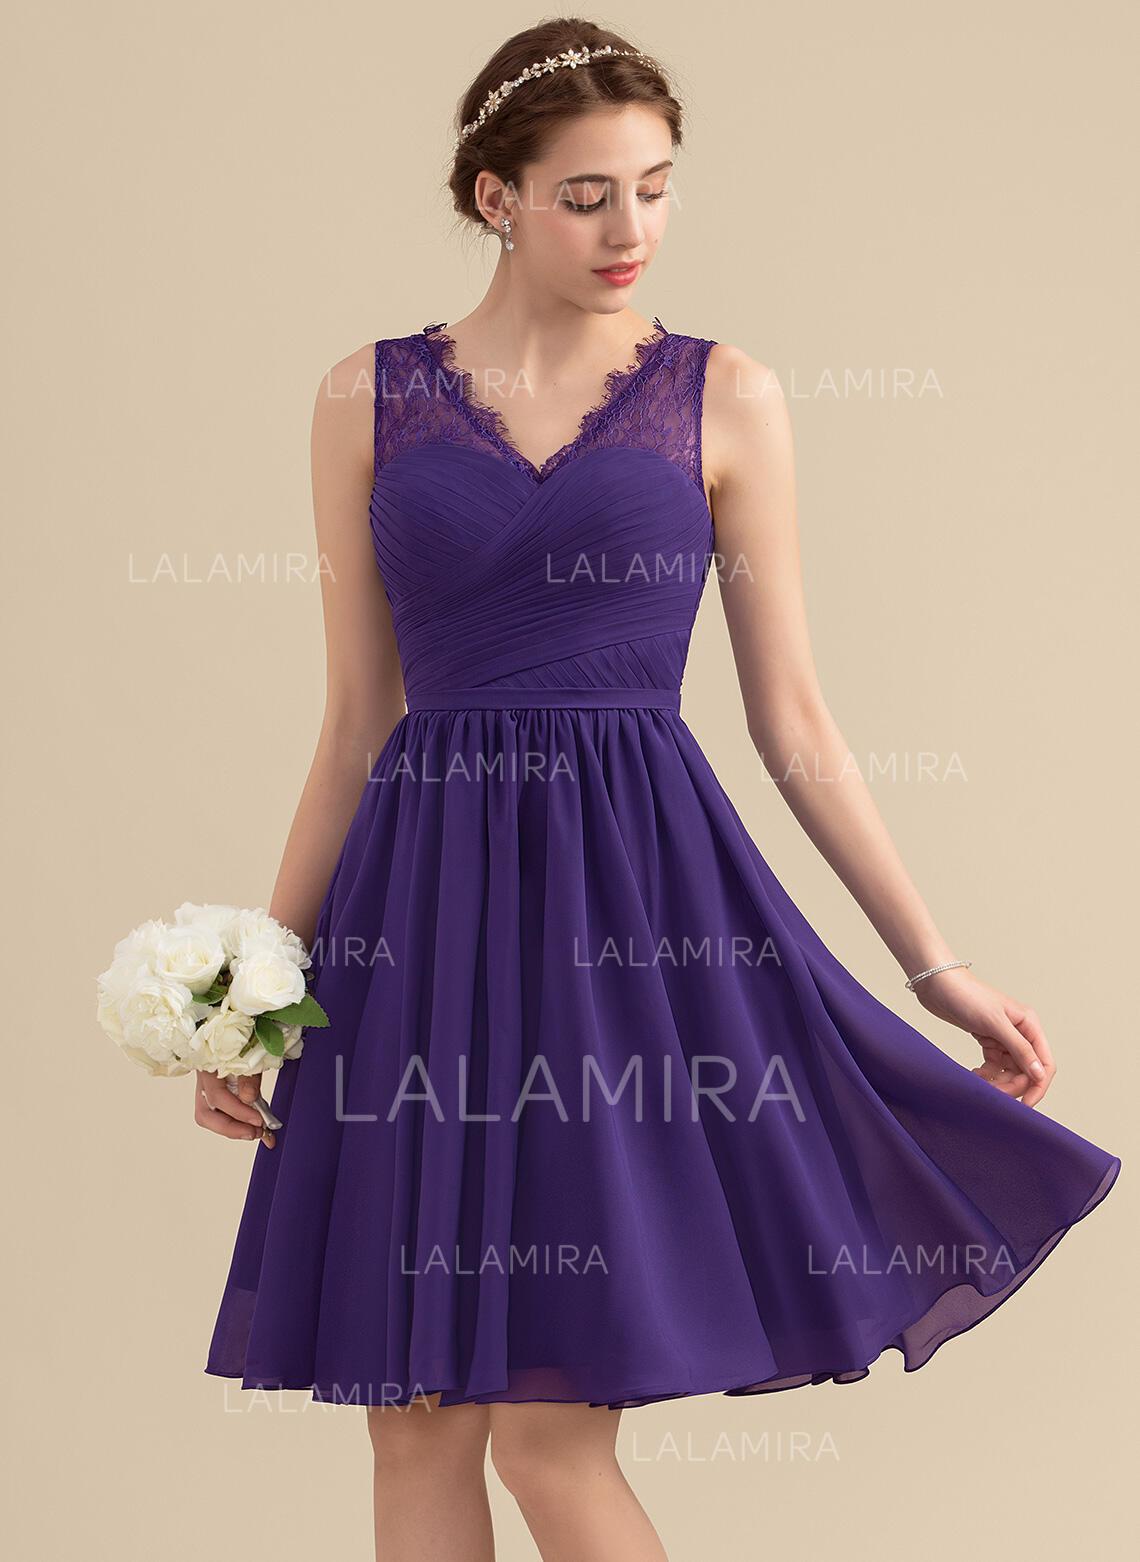 5db5166ce0619 A-Line/Princess V-neck Knee-Length Chiffon Lace Homecoming Dress With.  Loading zoom